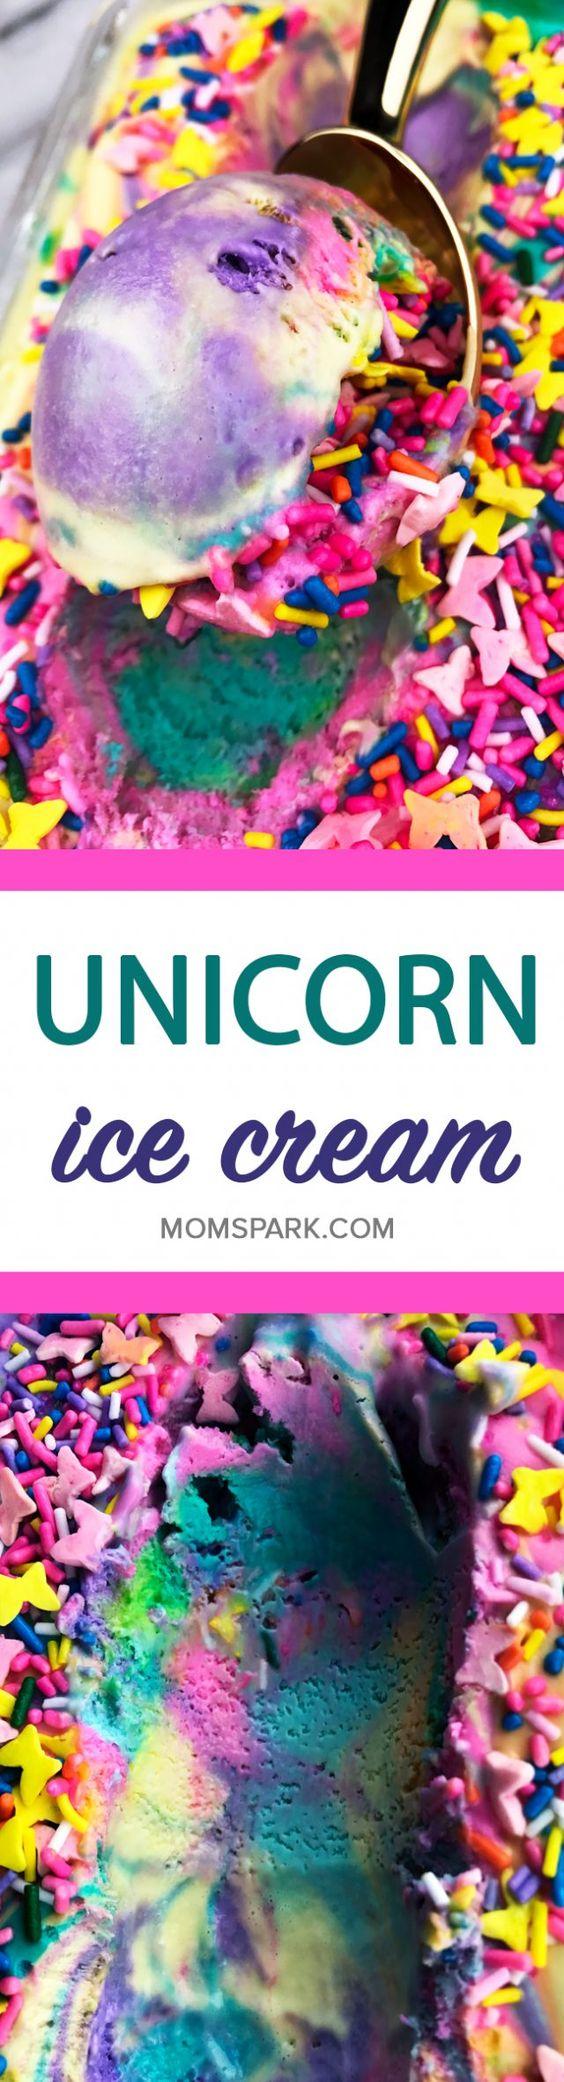 Unicorn desserts for a unicorn party: Rainbow Unicorn Ice Cream Recipe